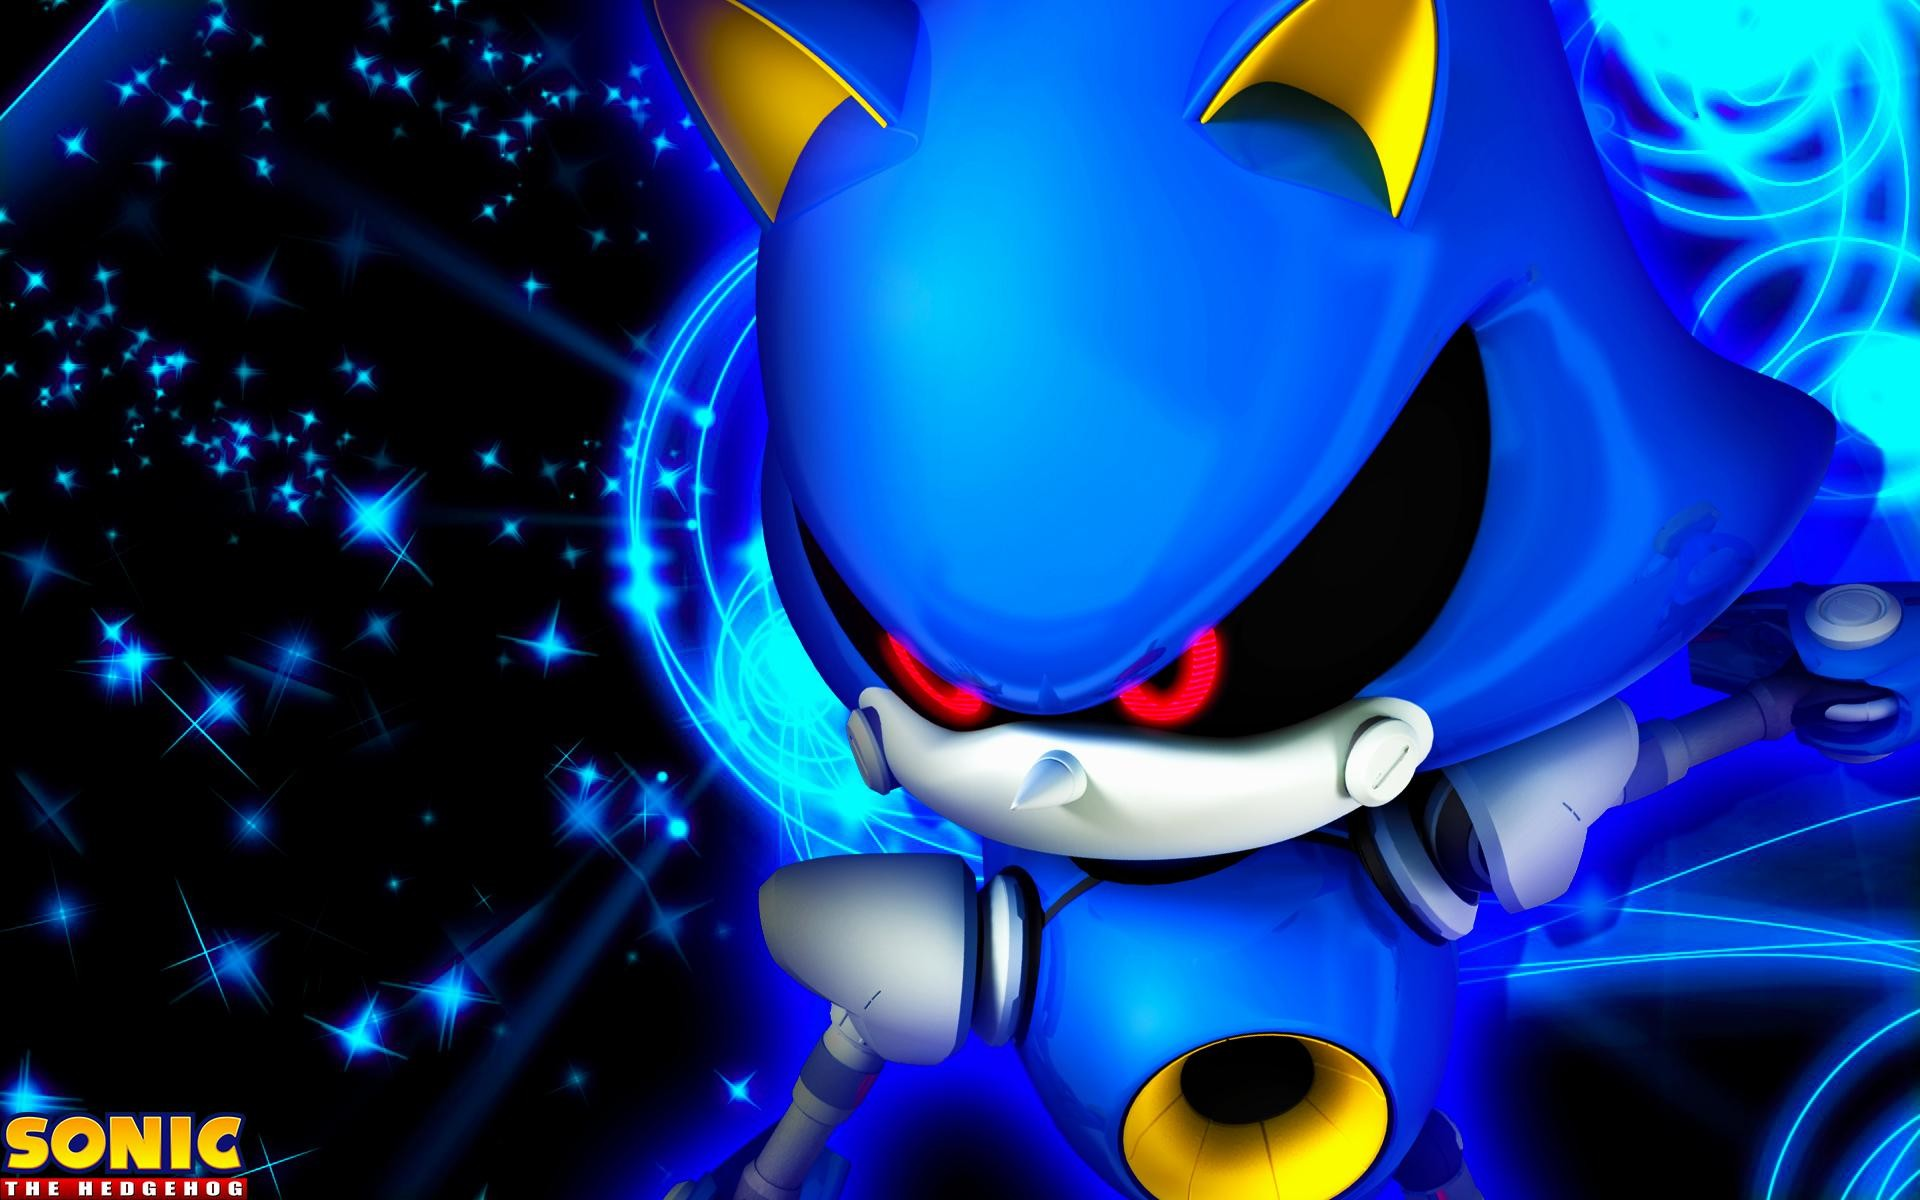 Metal-Vs-Sonic-1920×1080-by-Elesis-Knight-on-